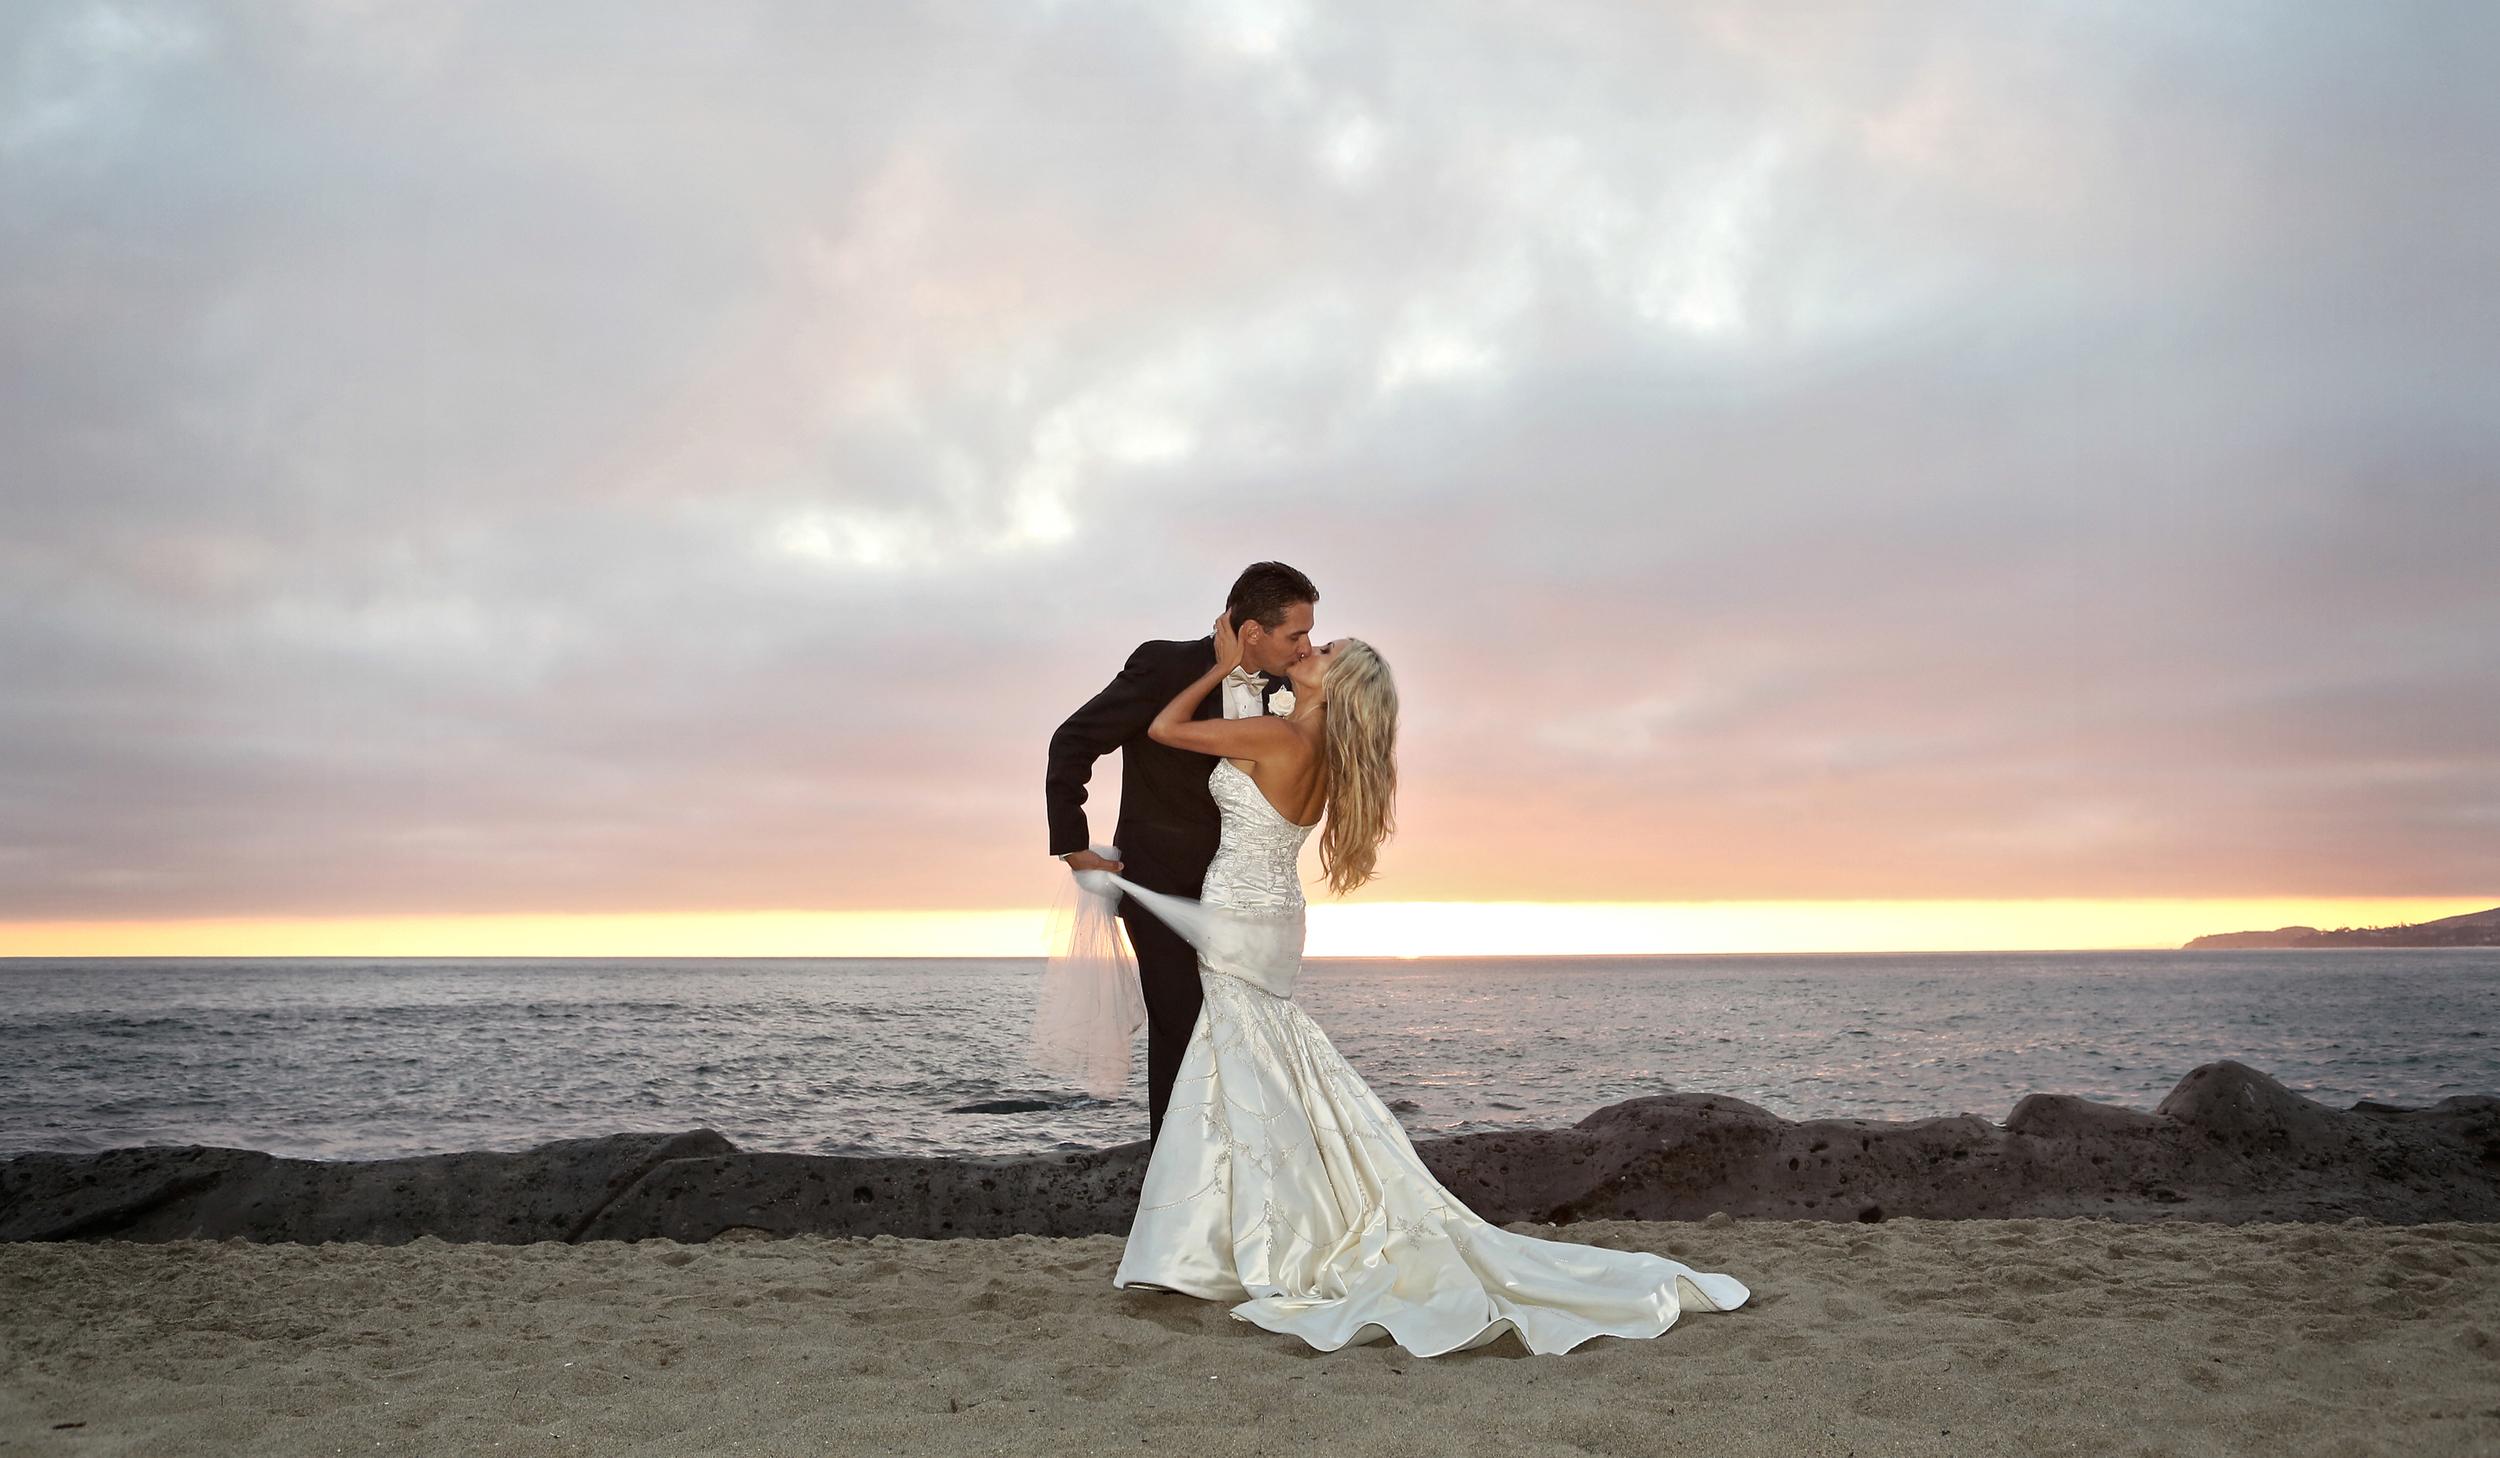 Romantic sunset kiss hdr toning crop.jpg